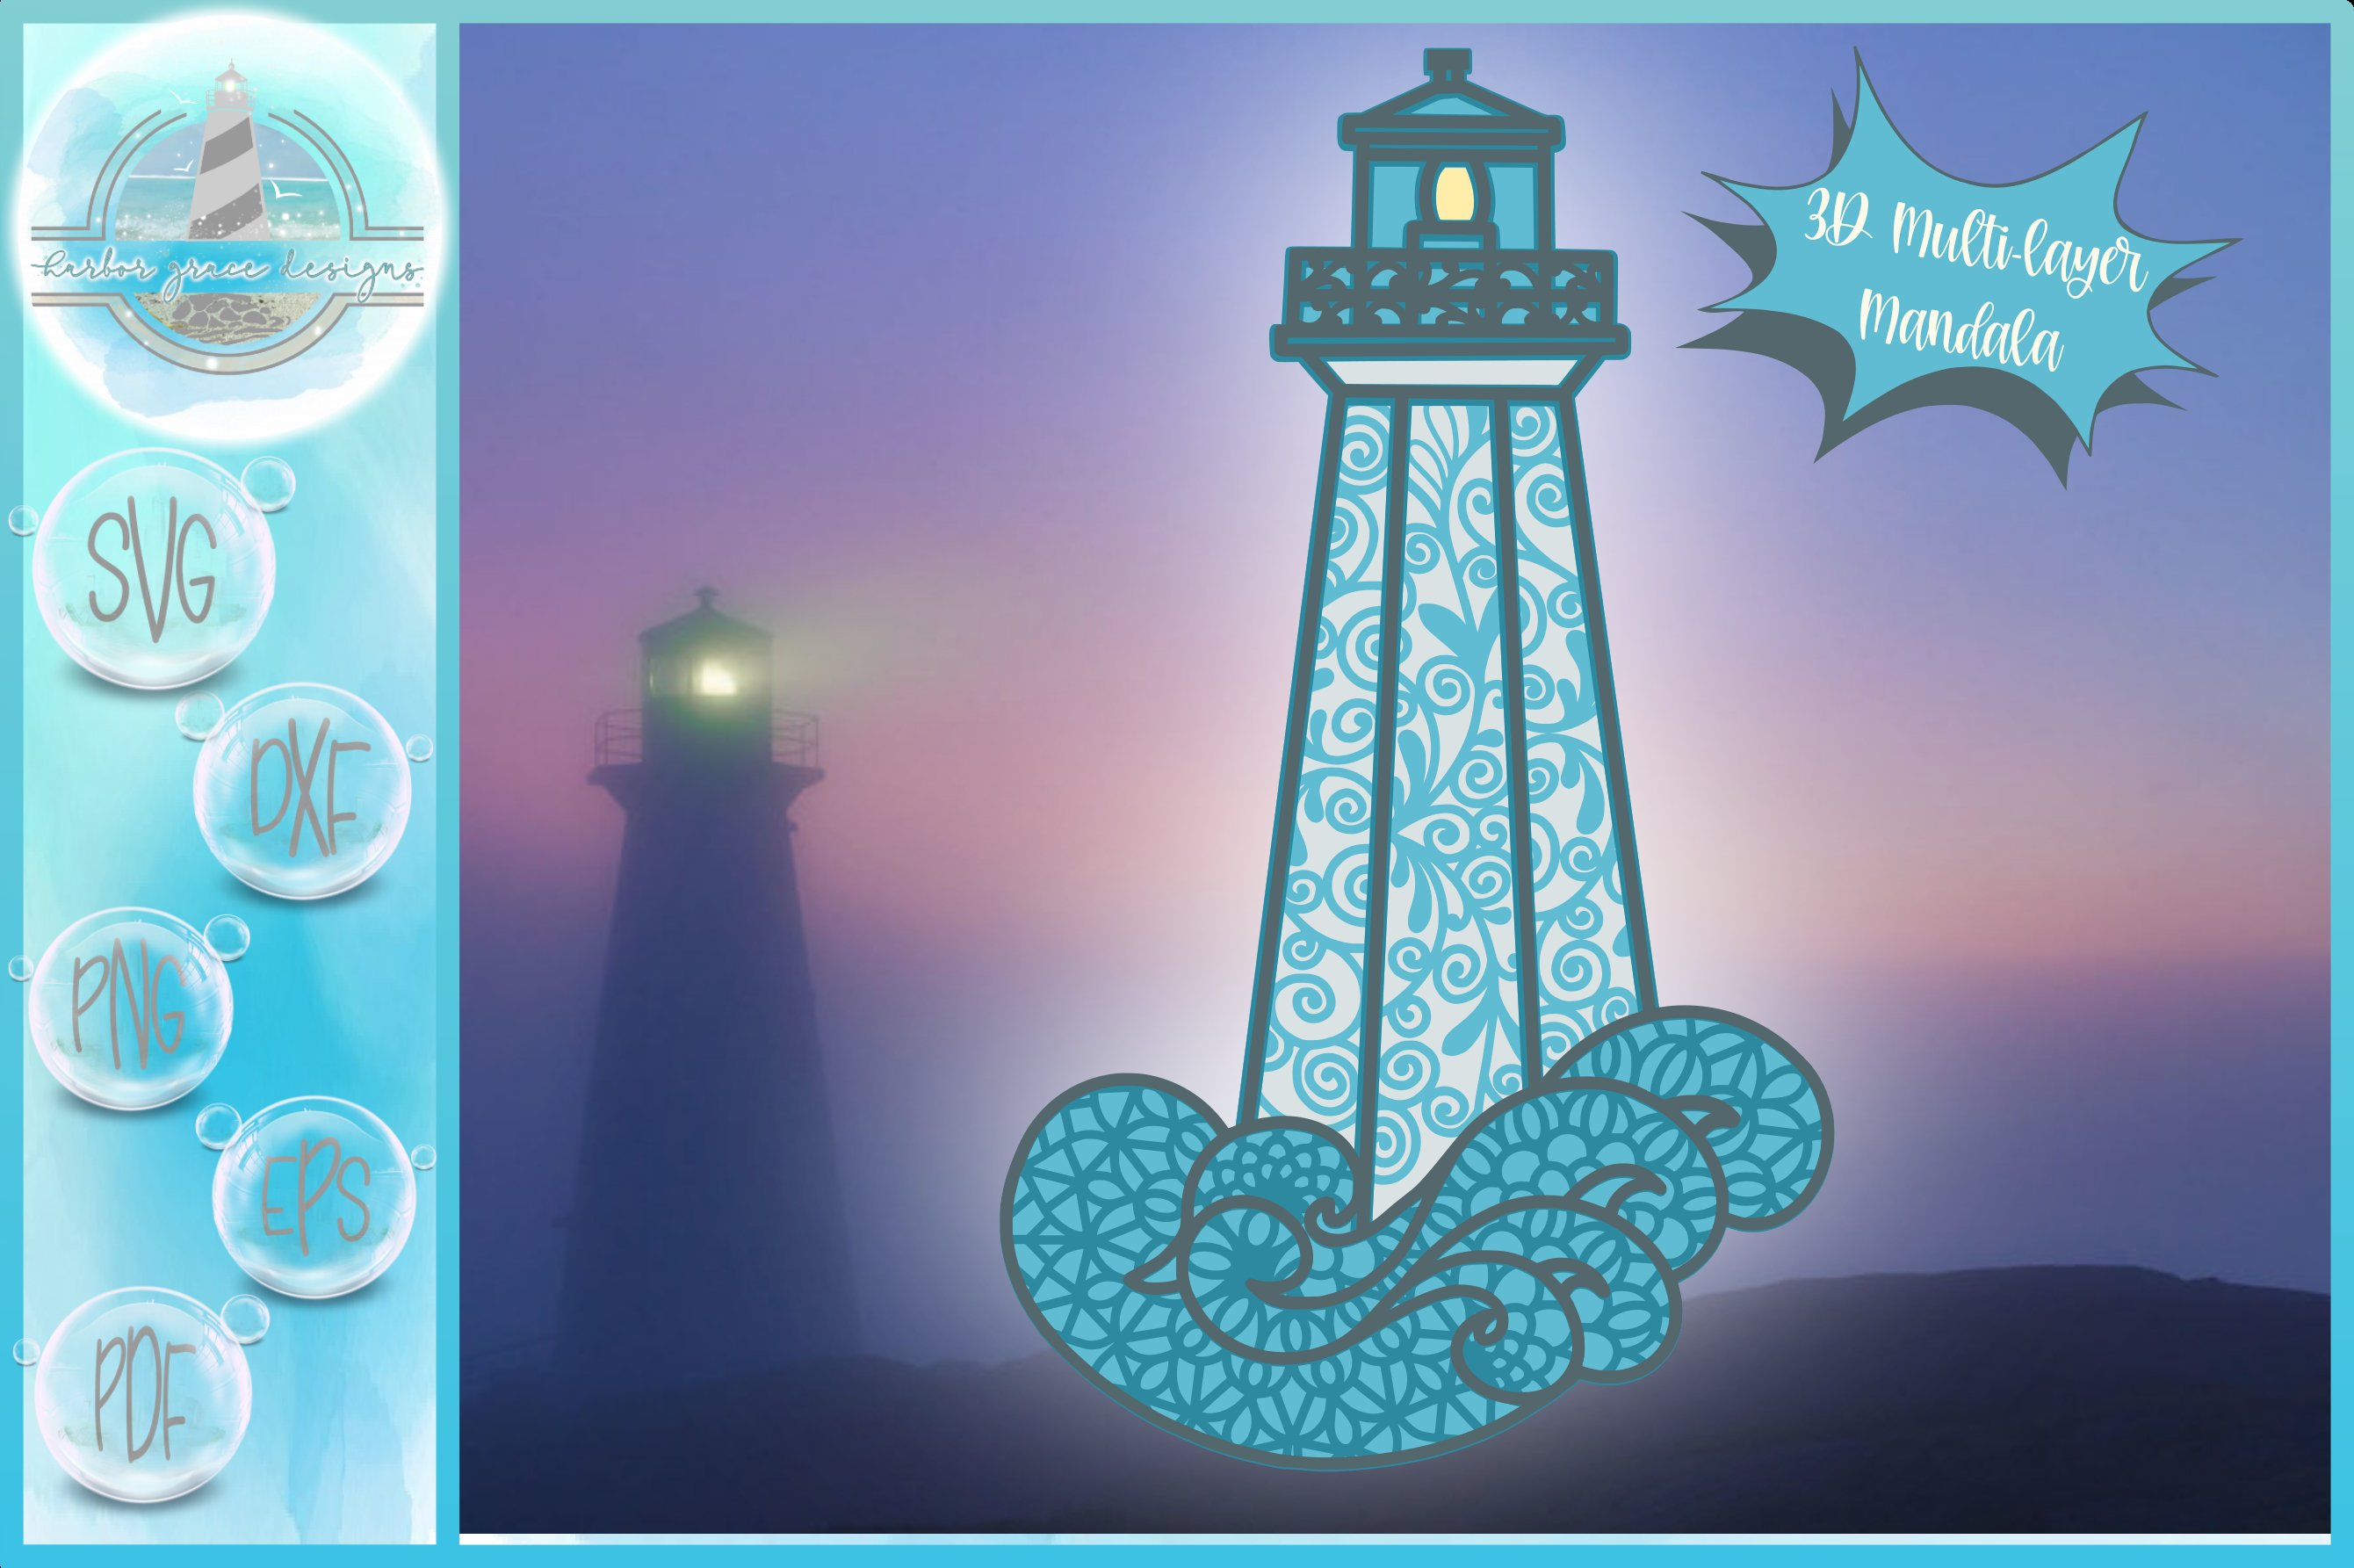 Download 3D Layered Design | 3D Lighthouse Mandala | 3D Mandala SVG ...